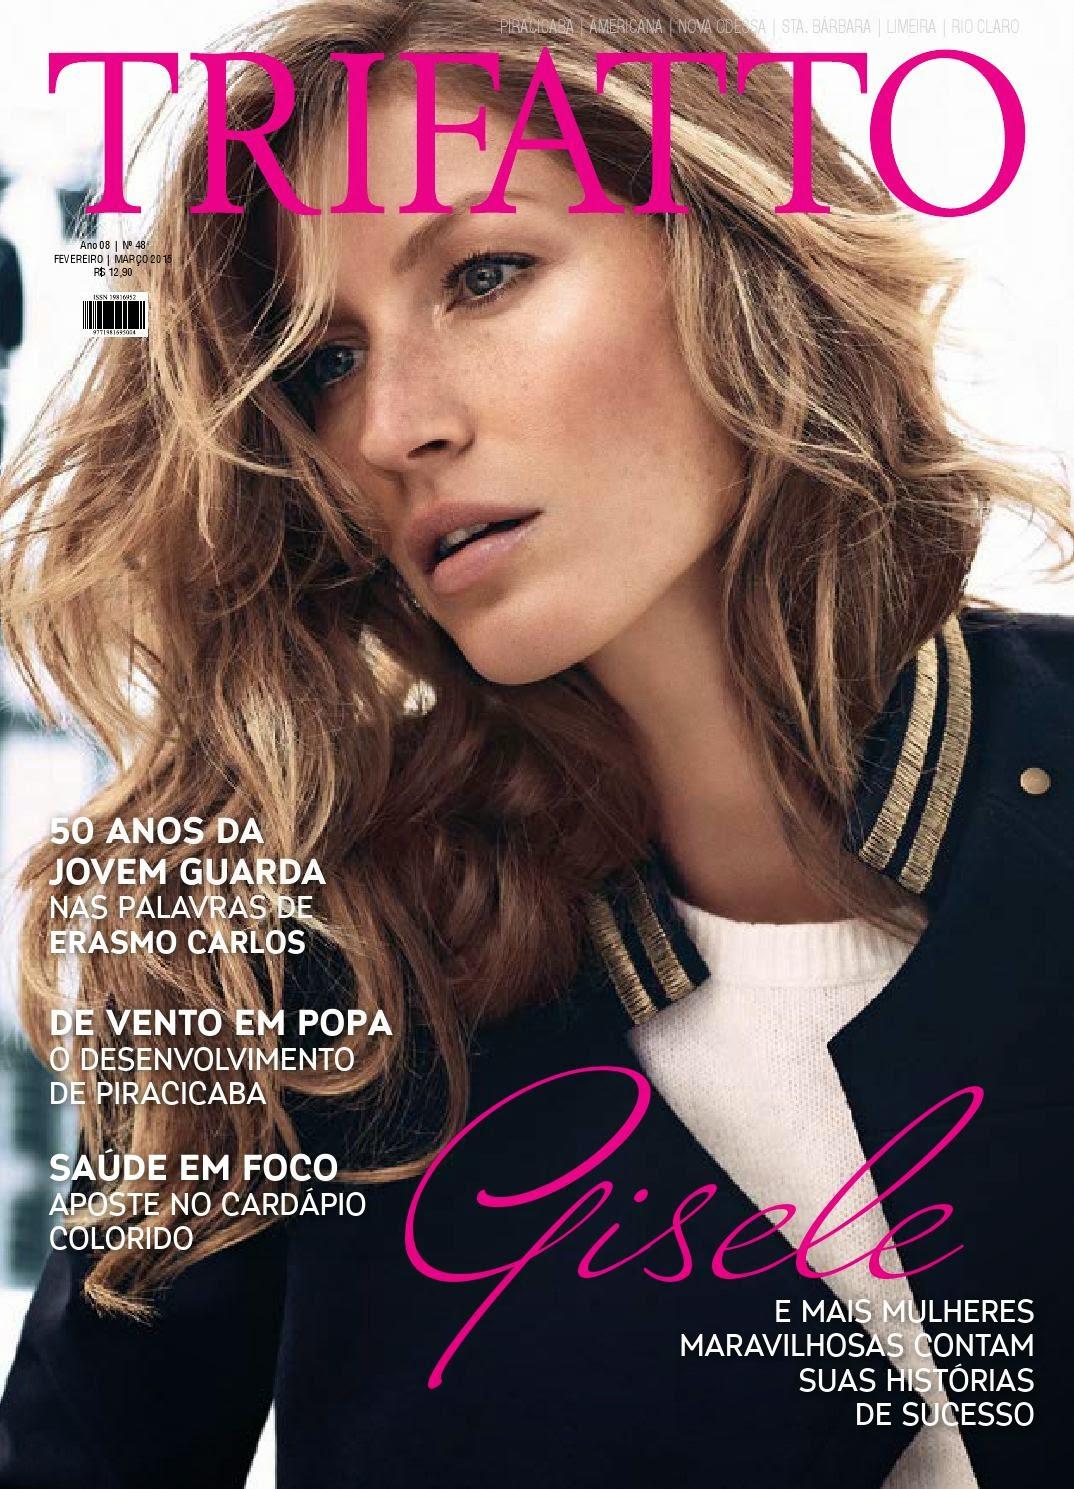 Actress, Producer, Supermodel: Gisele Bundchen -Trifatto  Brazil, March 2015